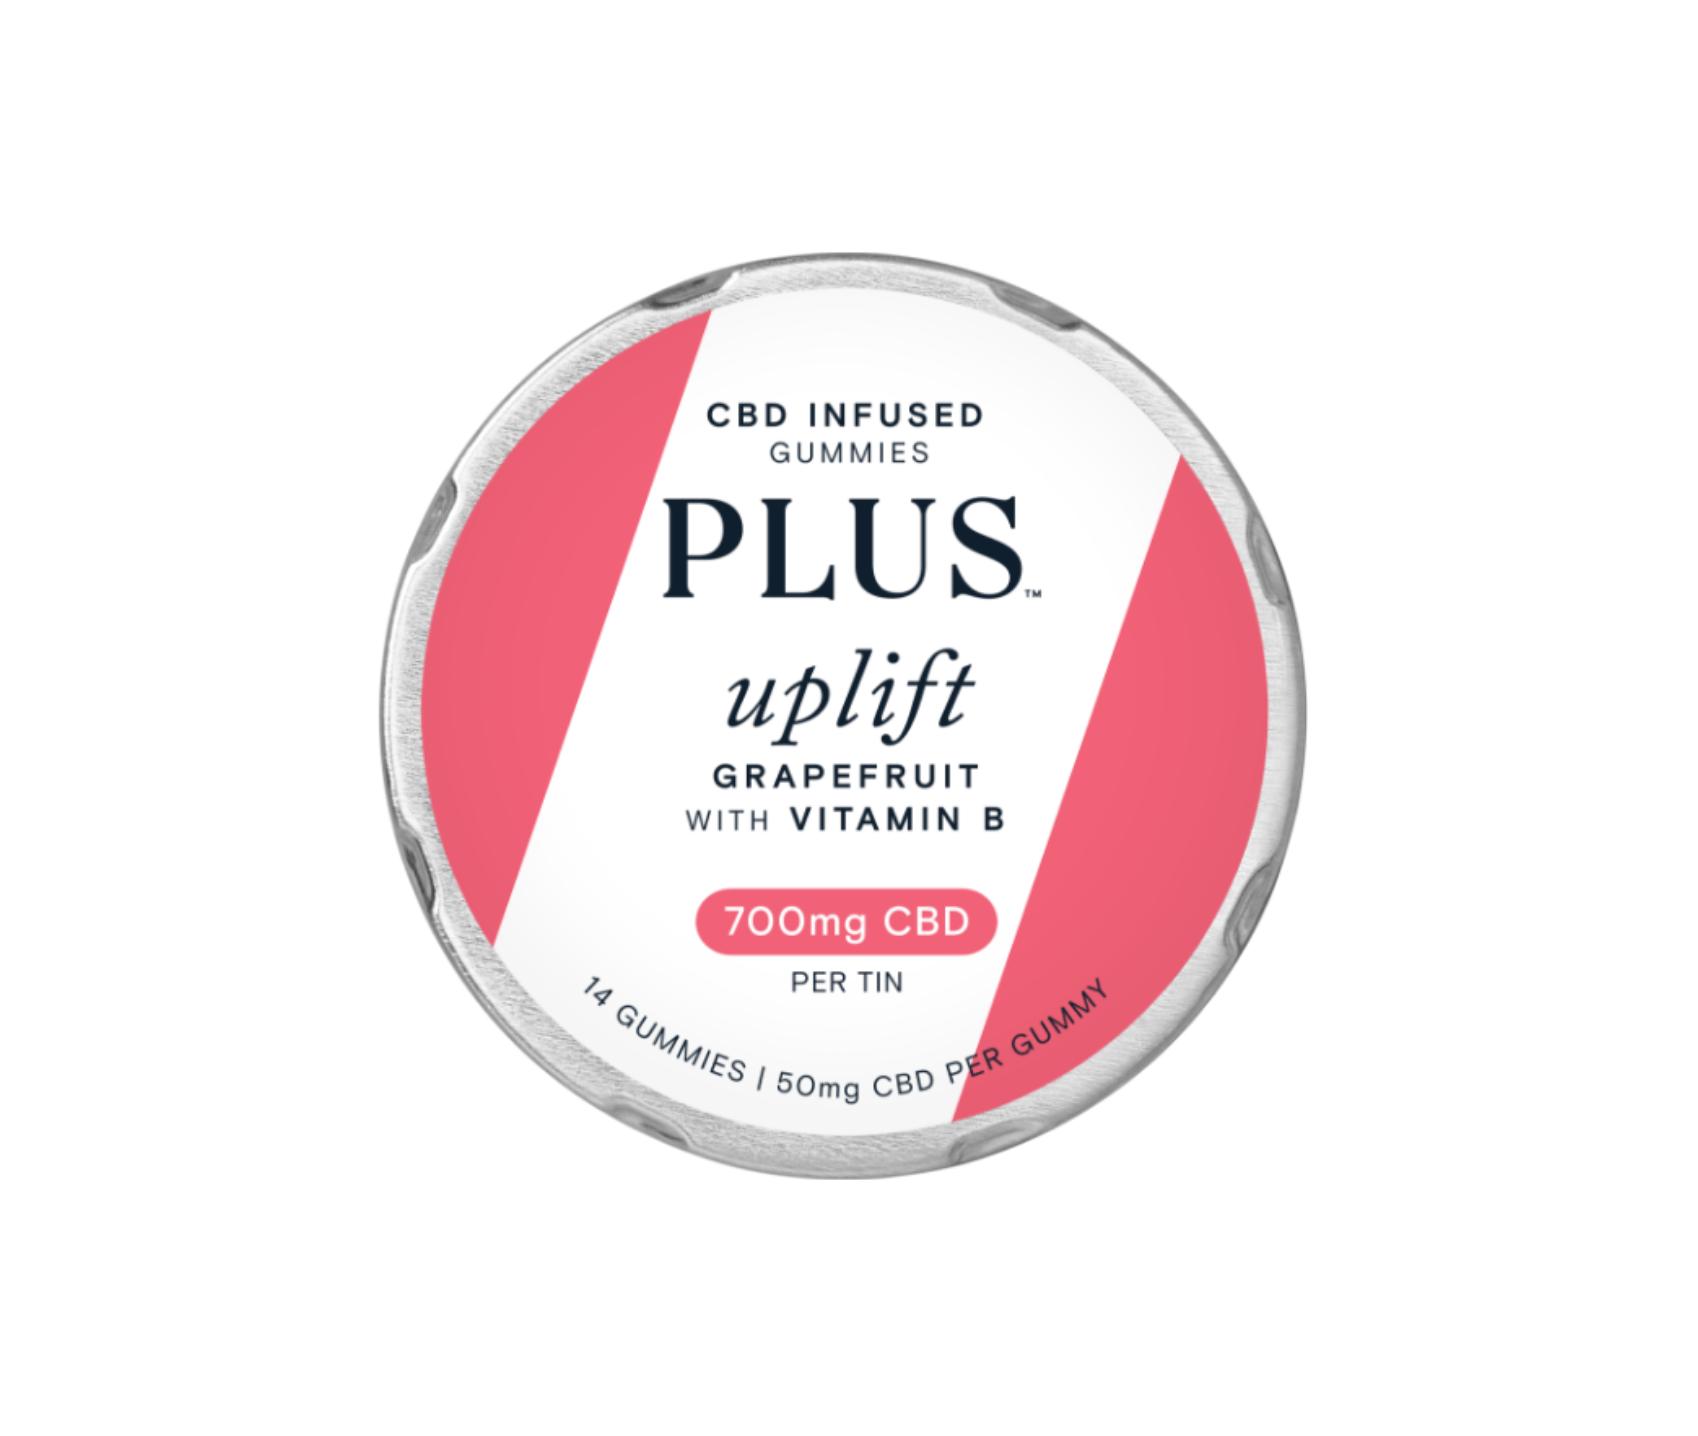 PLUS CBD uplift gummy HQ